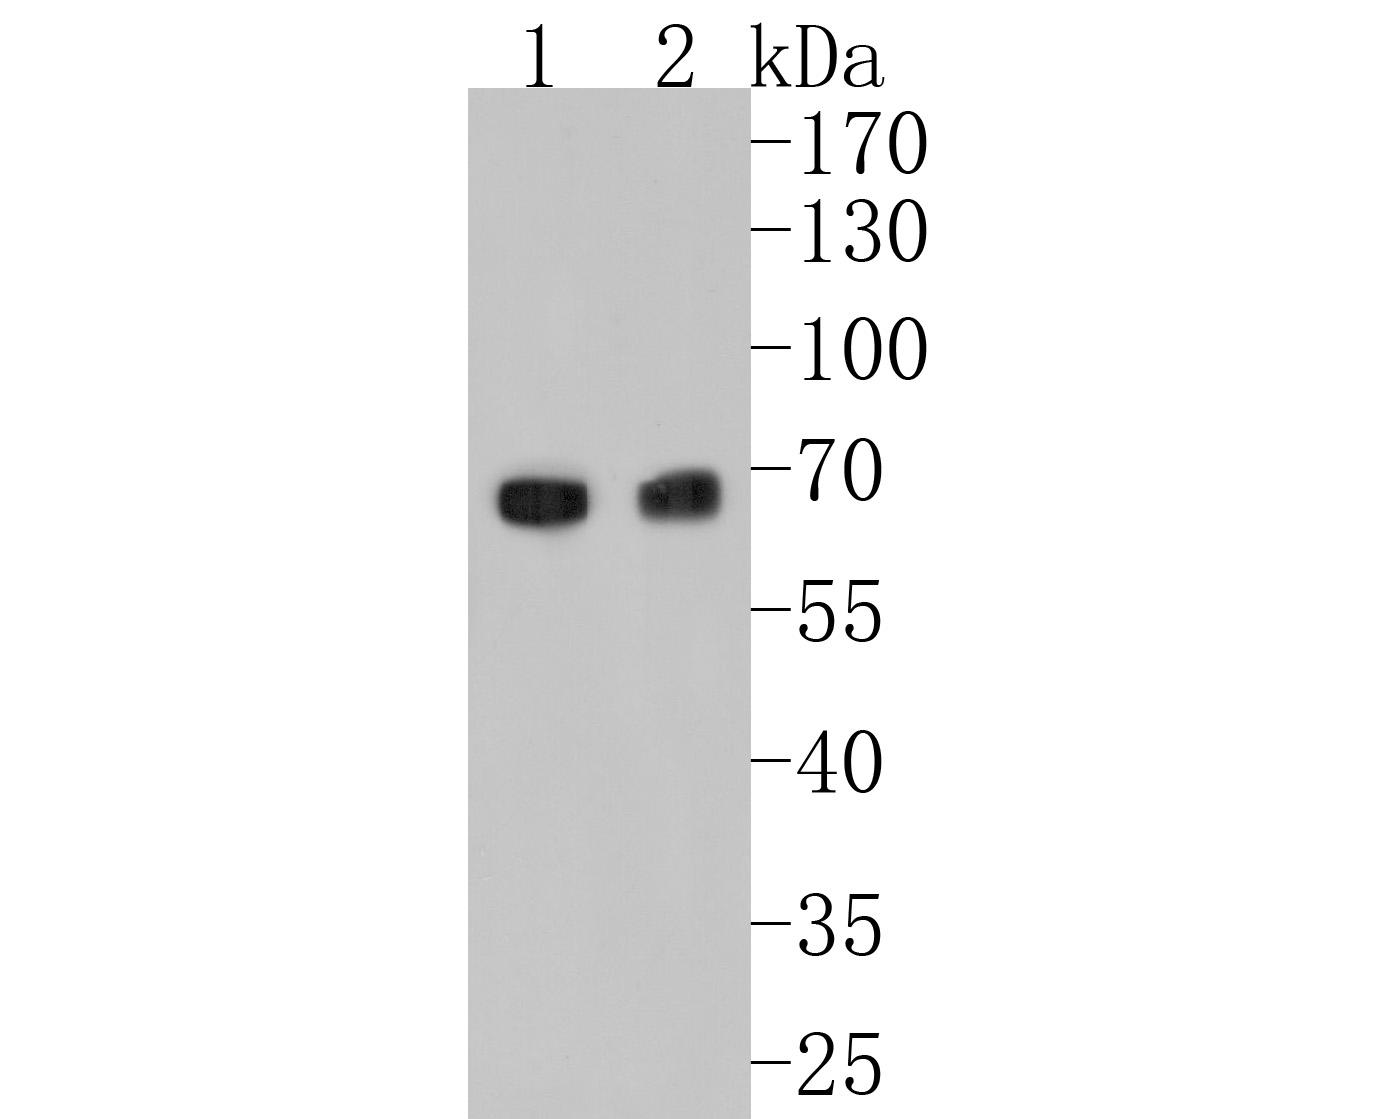 Western blot analysis of Klotho on human serum lysate using anti-Klotho antibody at 1/1,000 dilution.